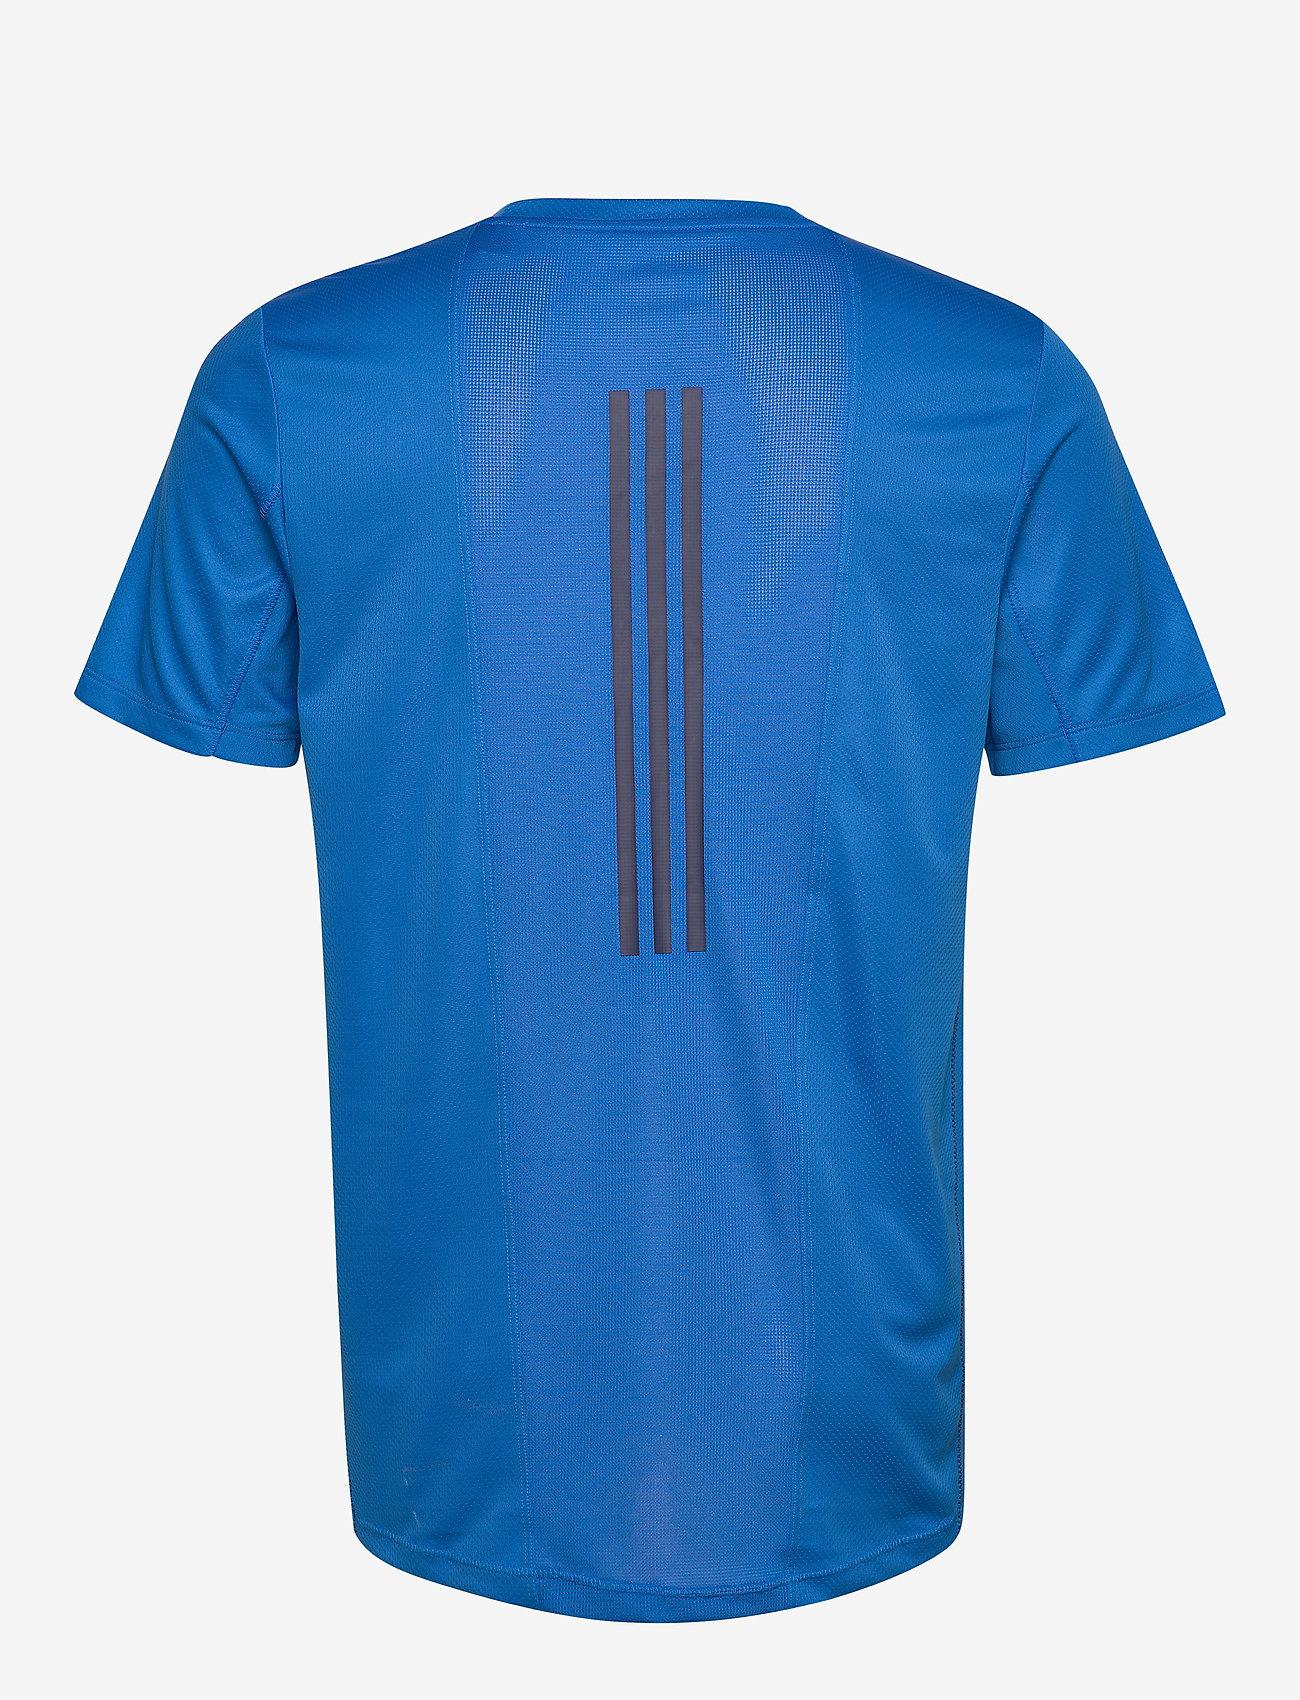 adidas Performance TRG TEE H.RDY - T-skjorter GLOBLU - Menn Klær